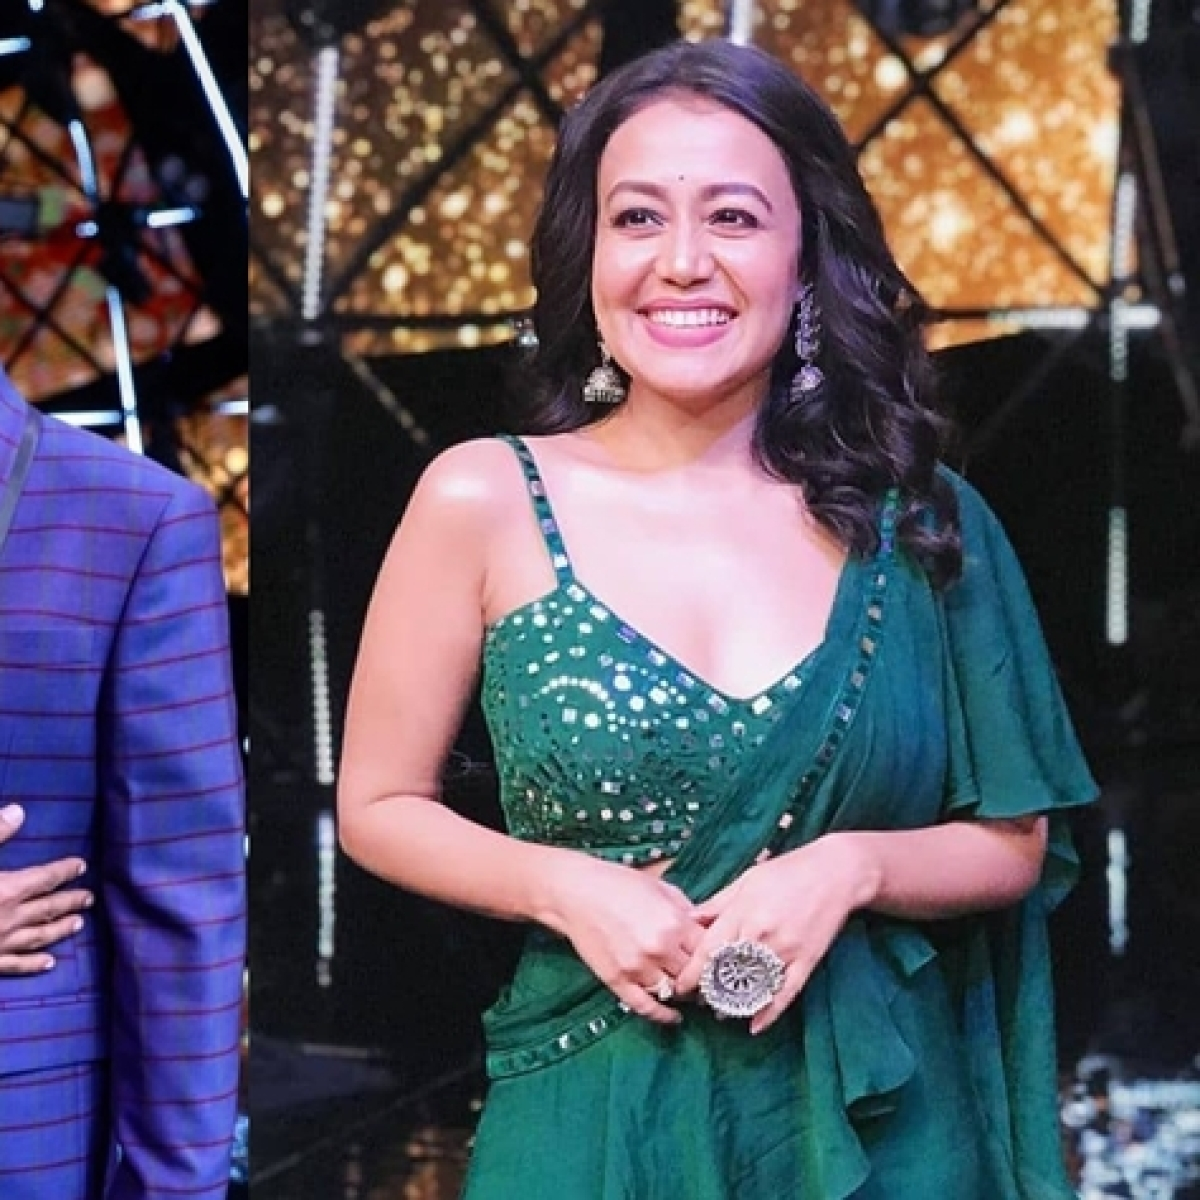 'Indian Idol 11' host Aditya Narayan and judge Neha Kakkar likely to get married?